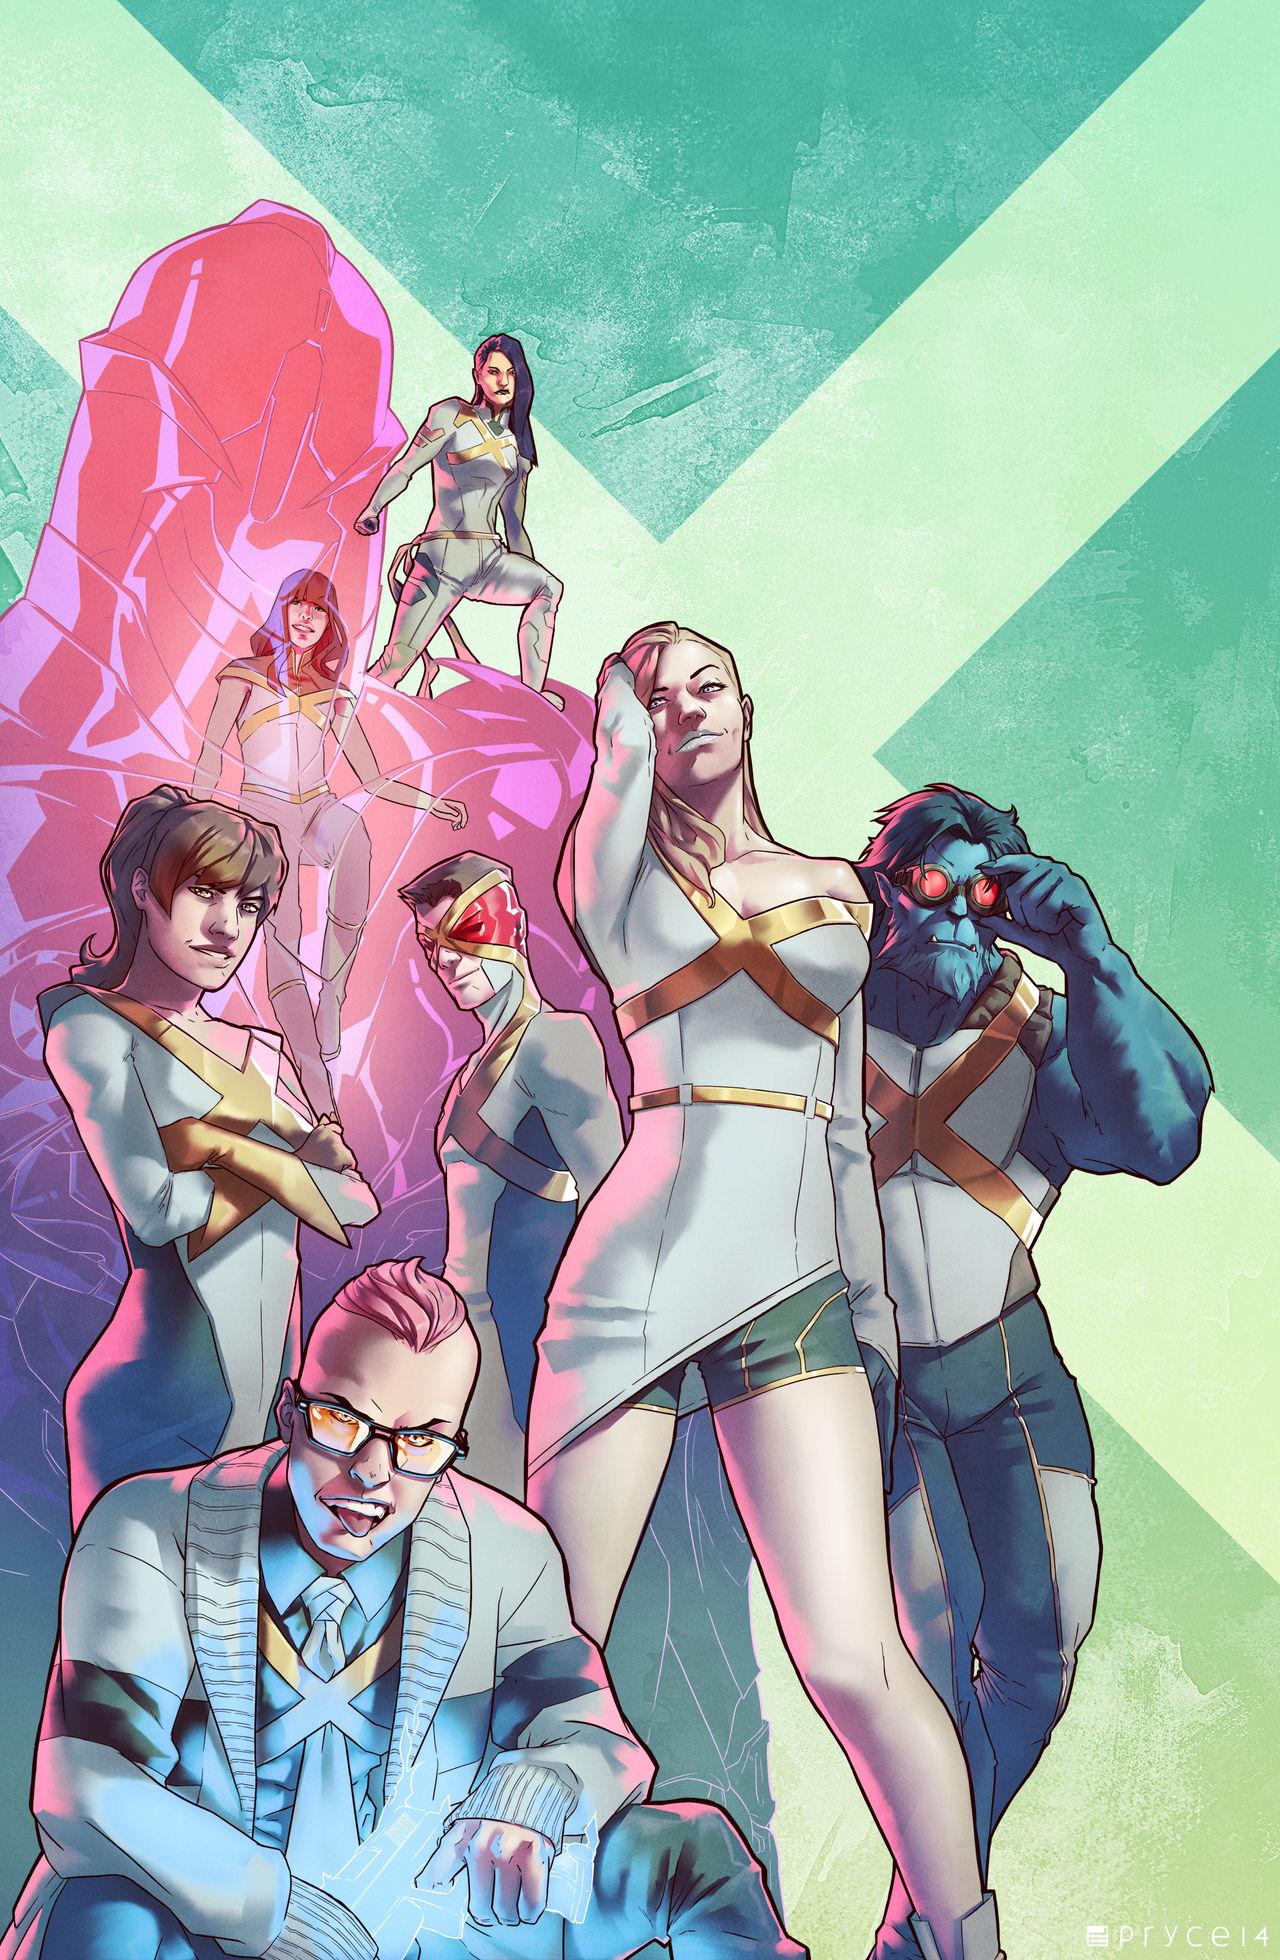 The Sensational X-Men